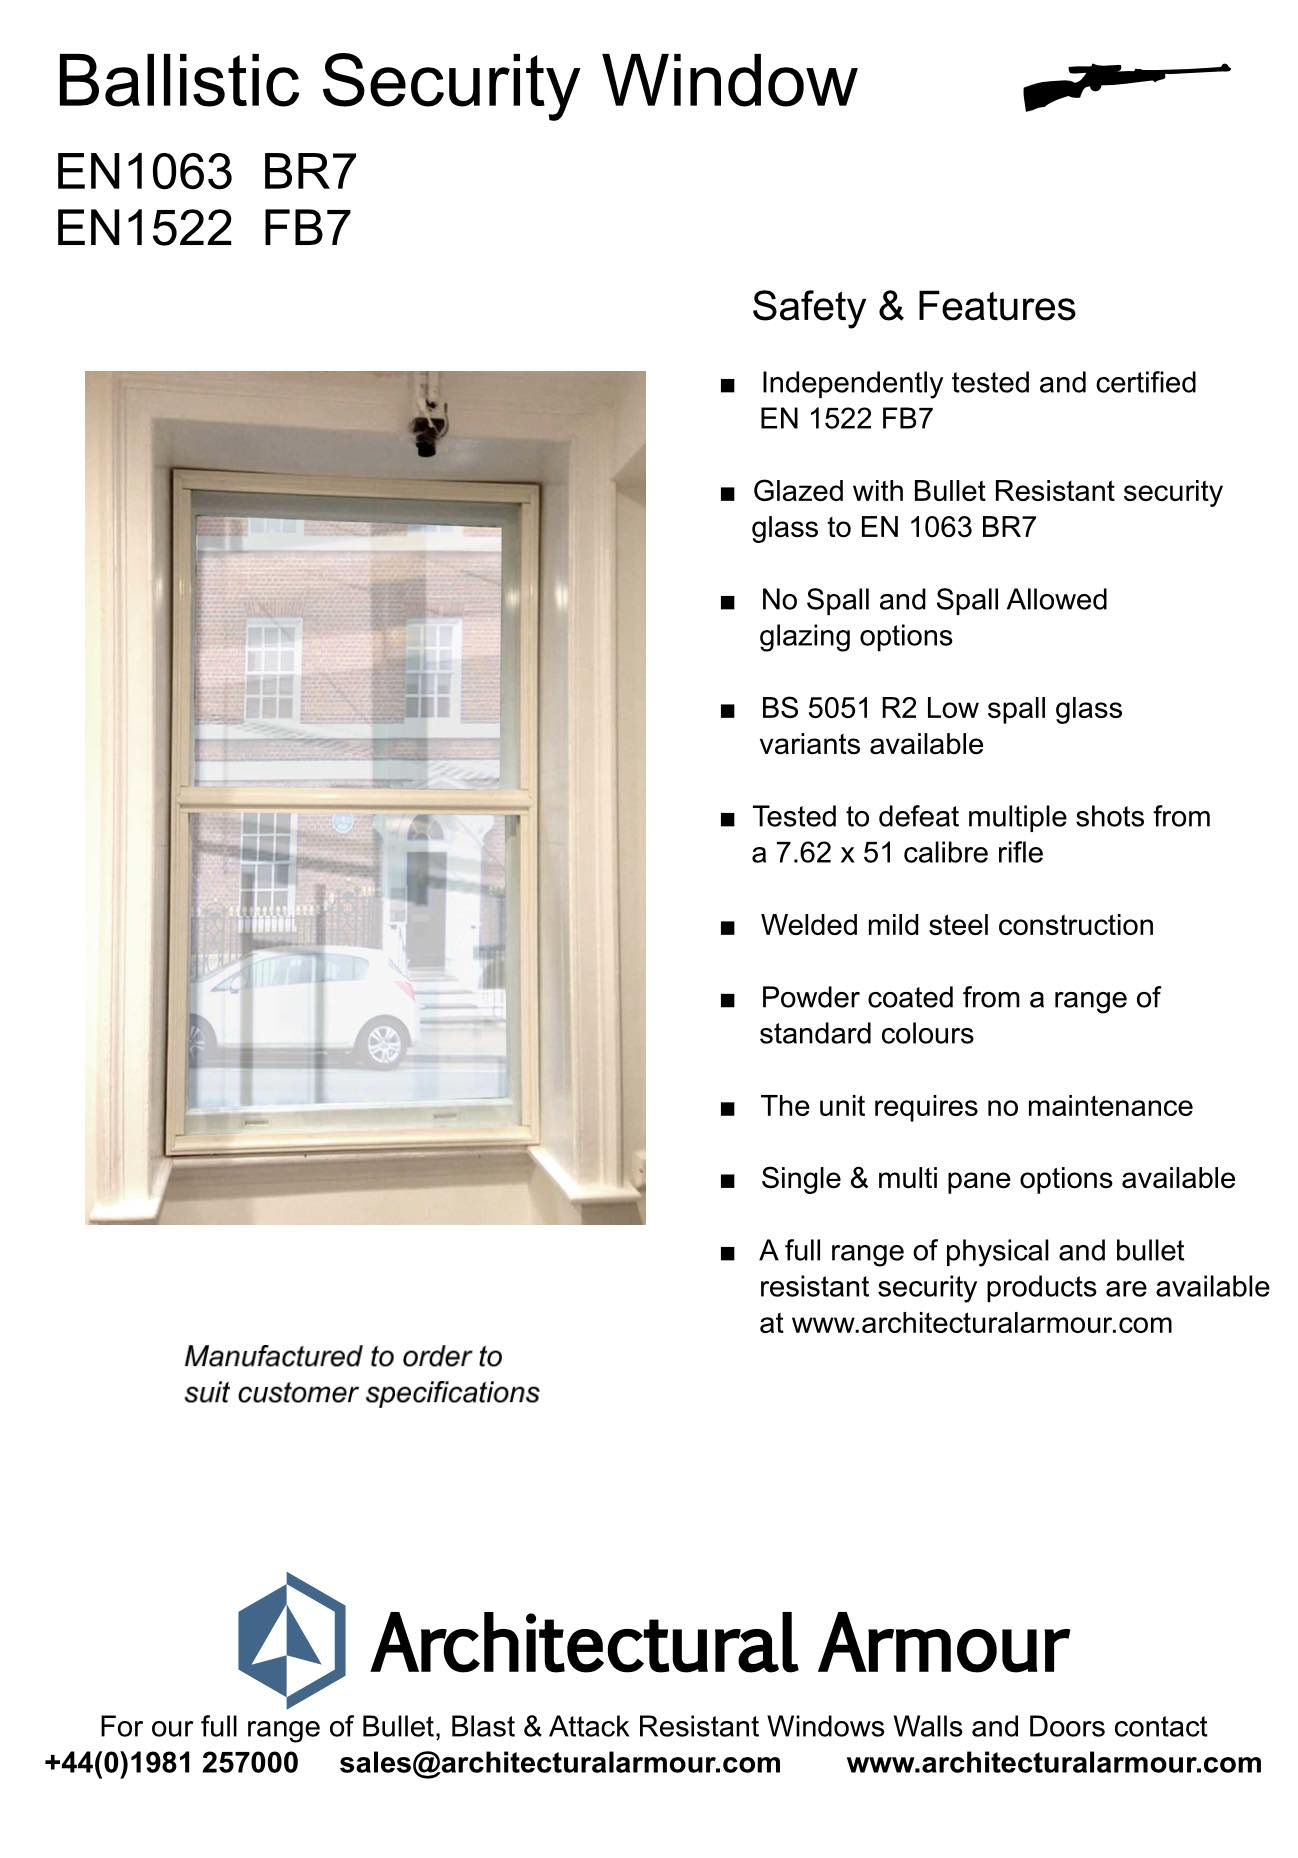 EN 1063 BR7 EN 1522 FB7 Bullet Resistant Window Image